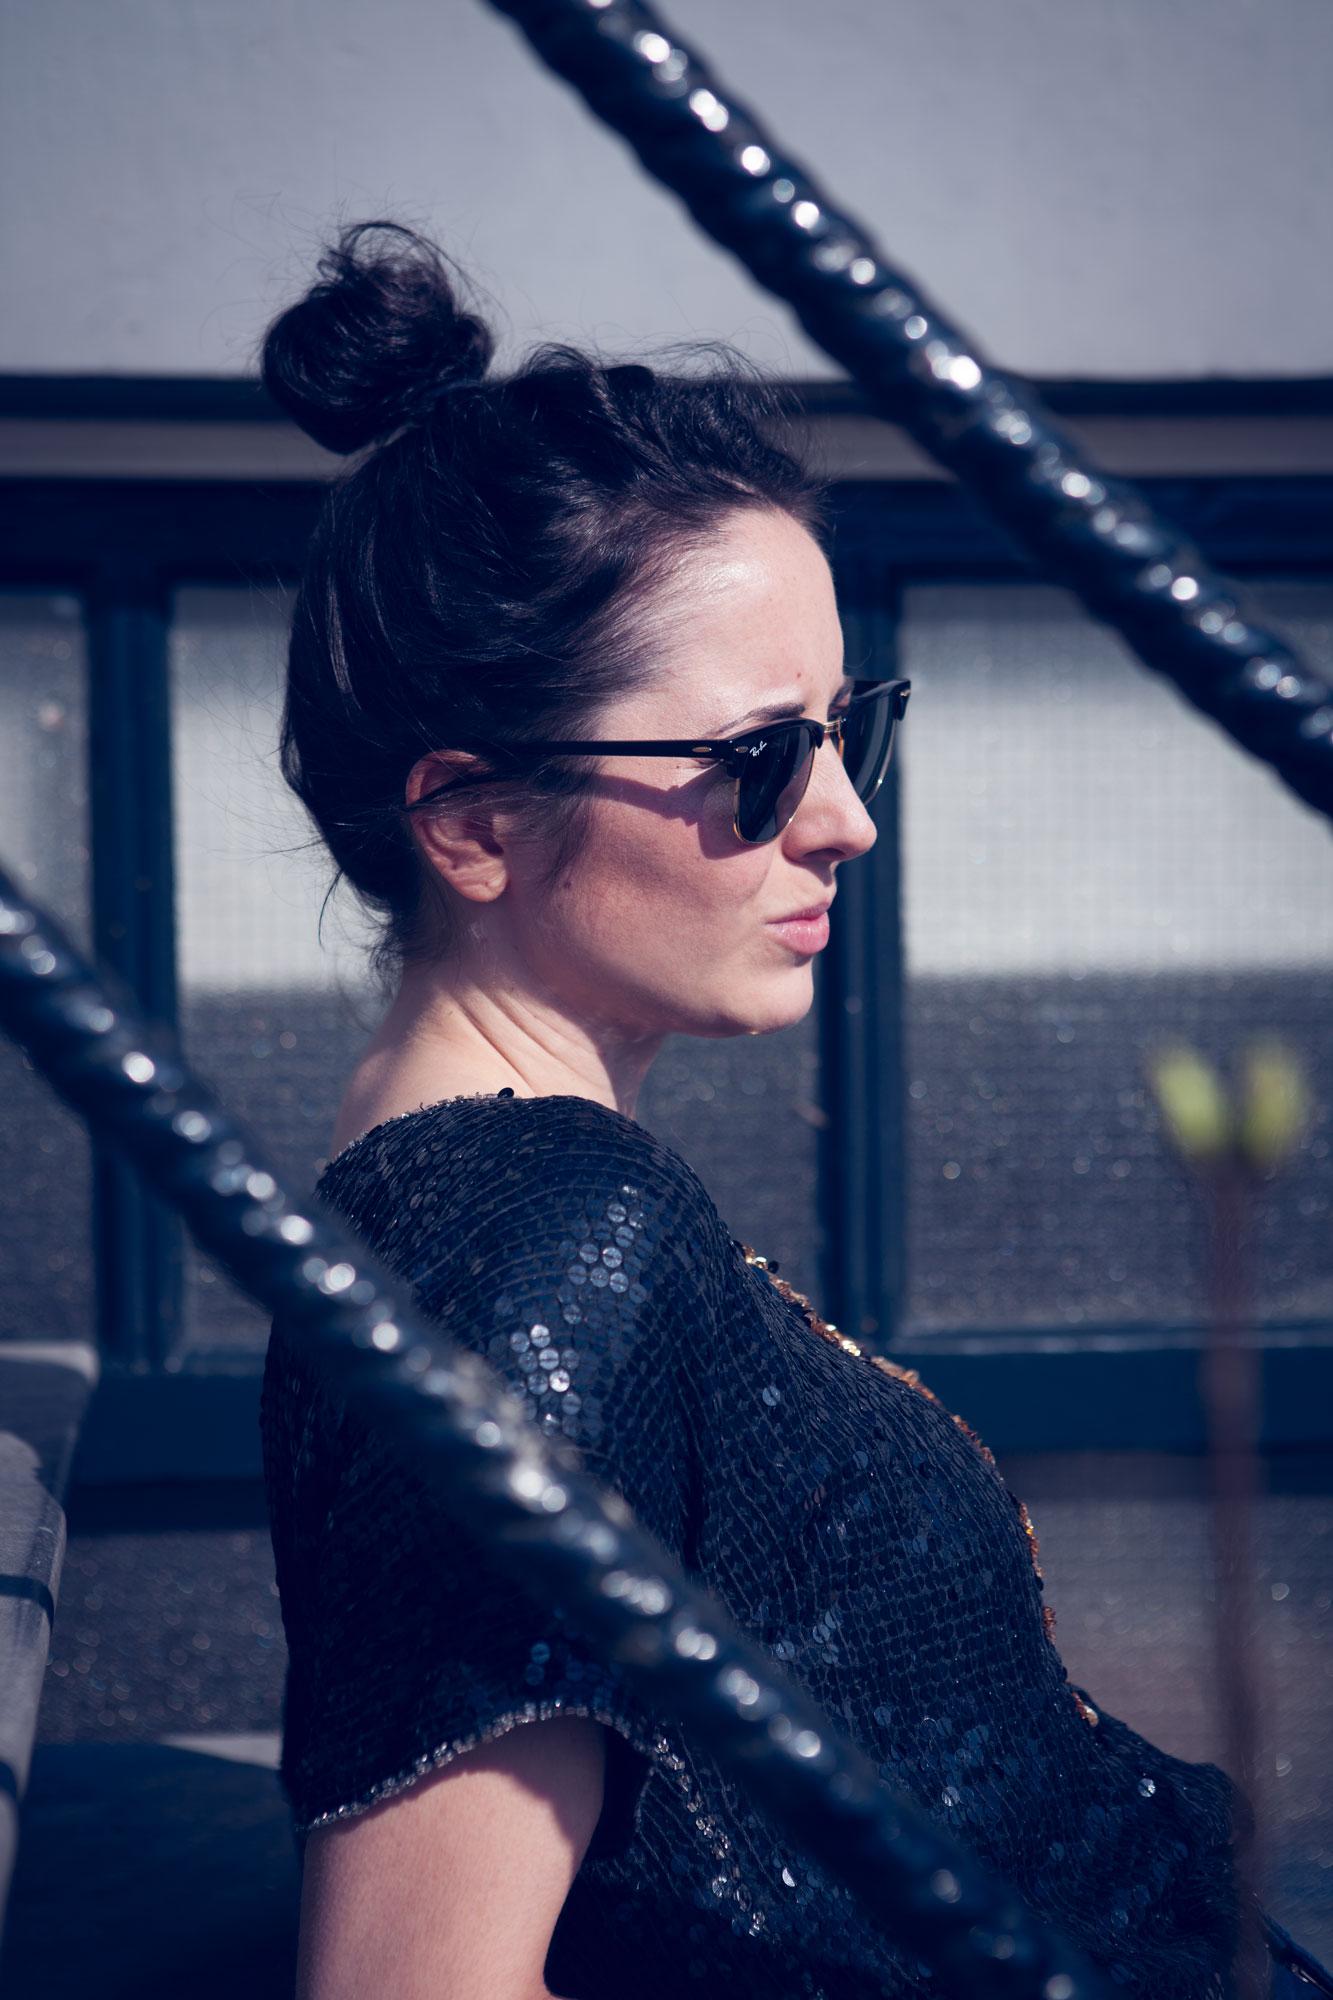 Laura buiten trapje zonnebril.jpg